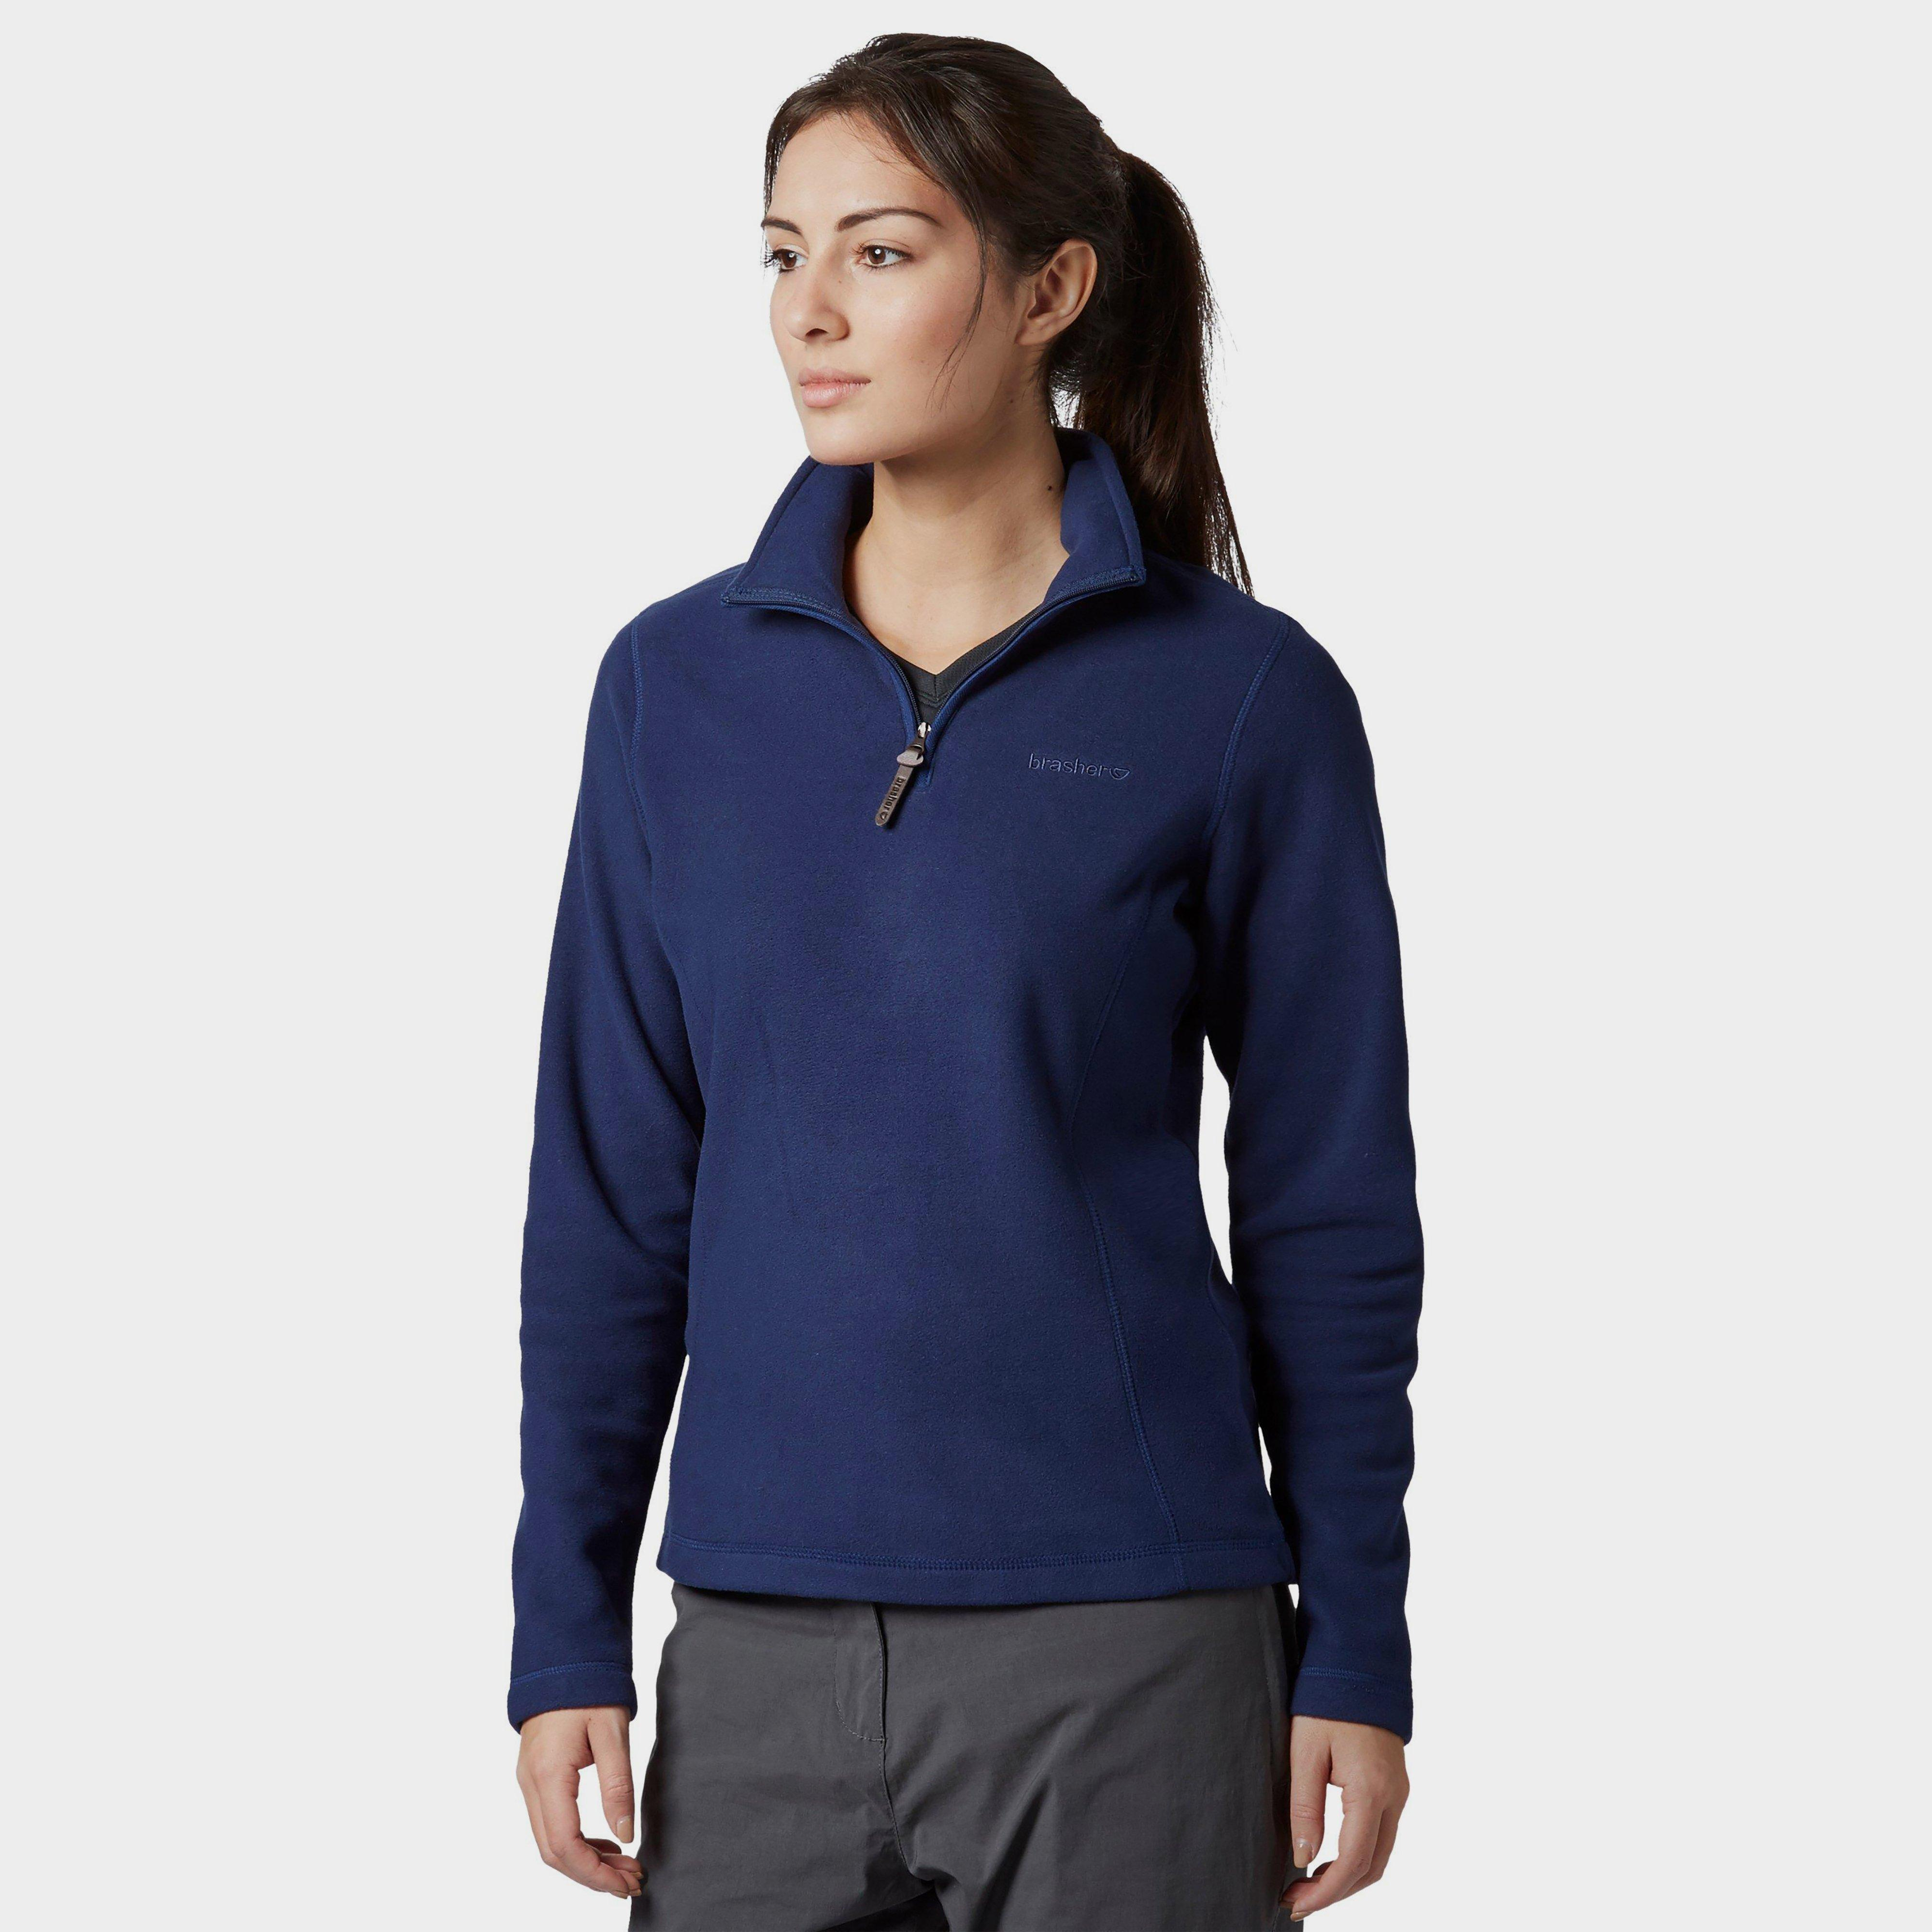 Brasher Womens Bleaberry Half Zip Fleece - Navy/nvy  Navy/nvy